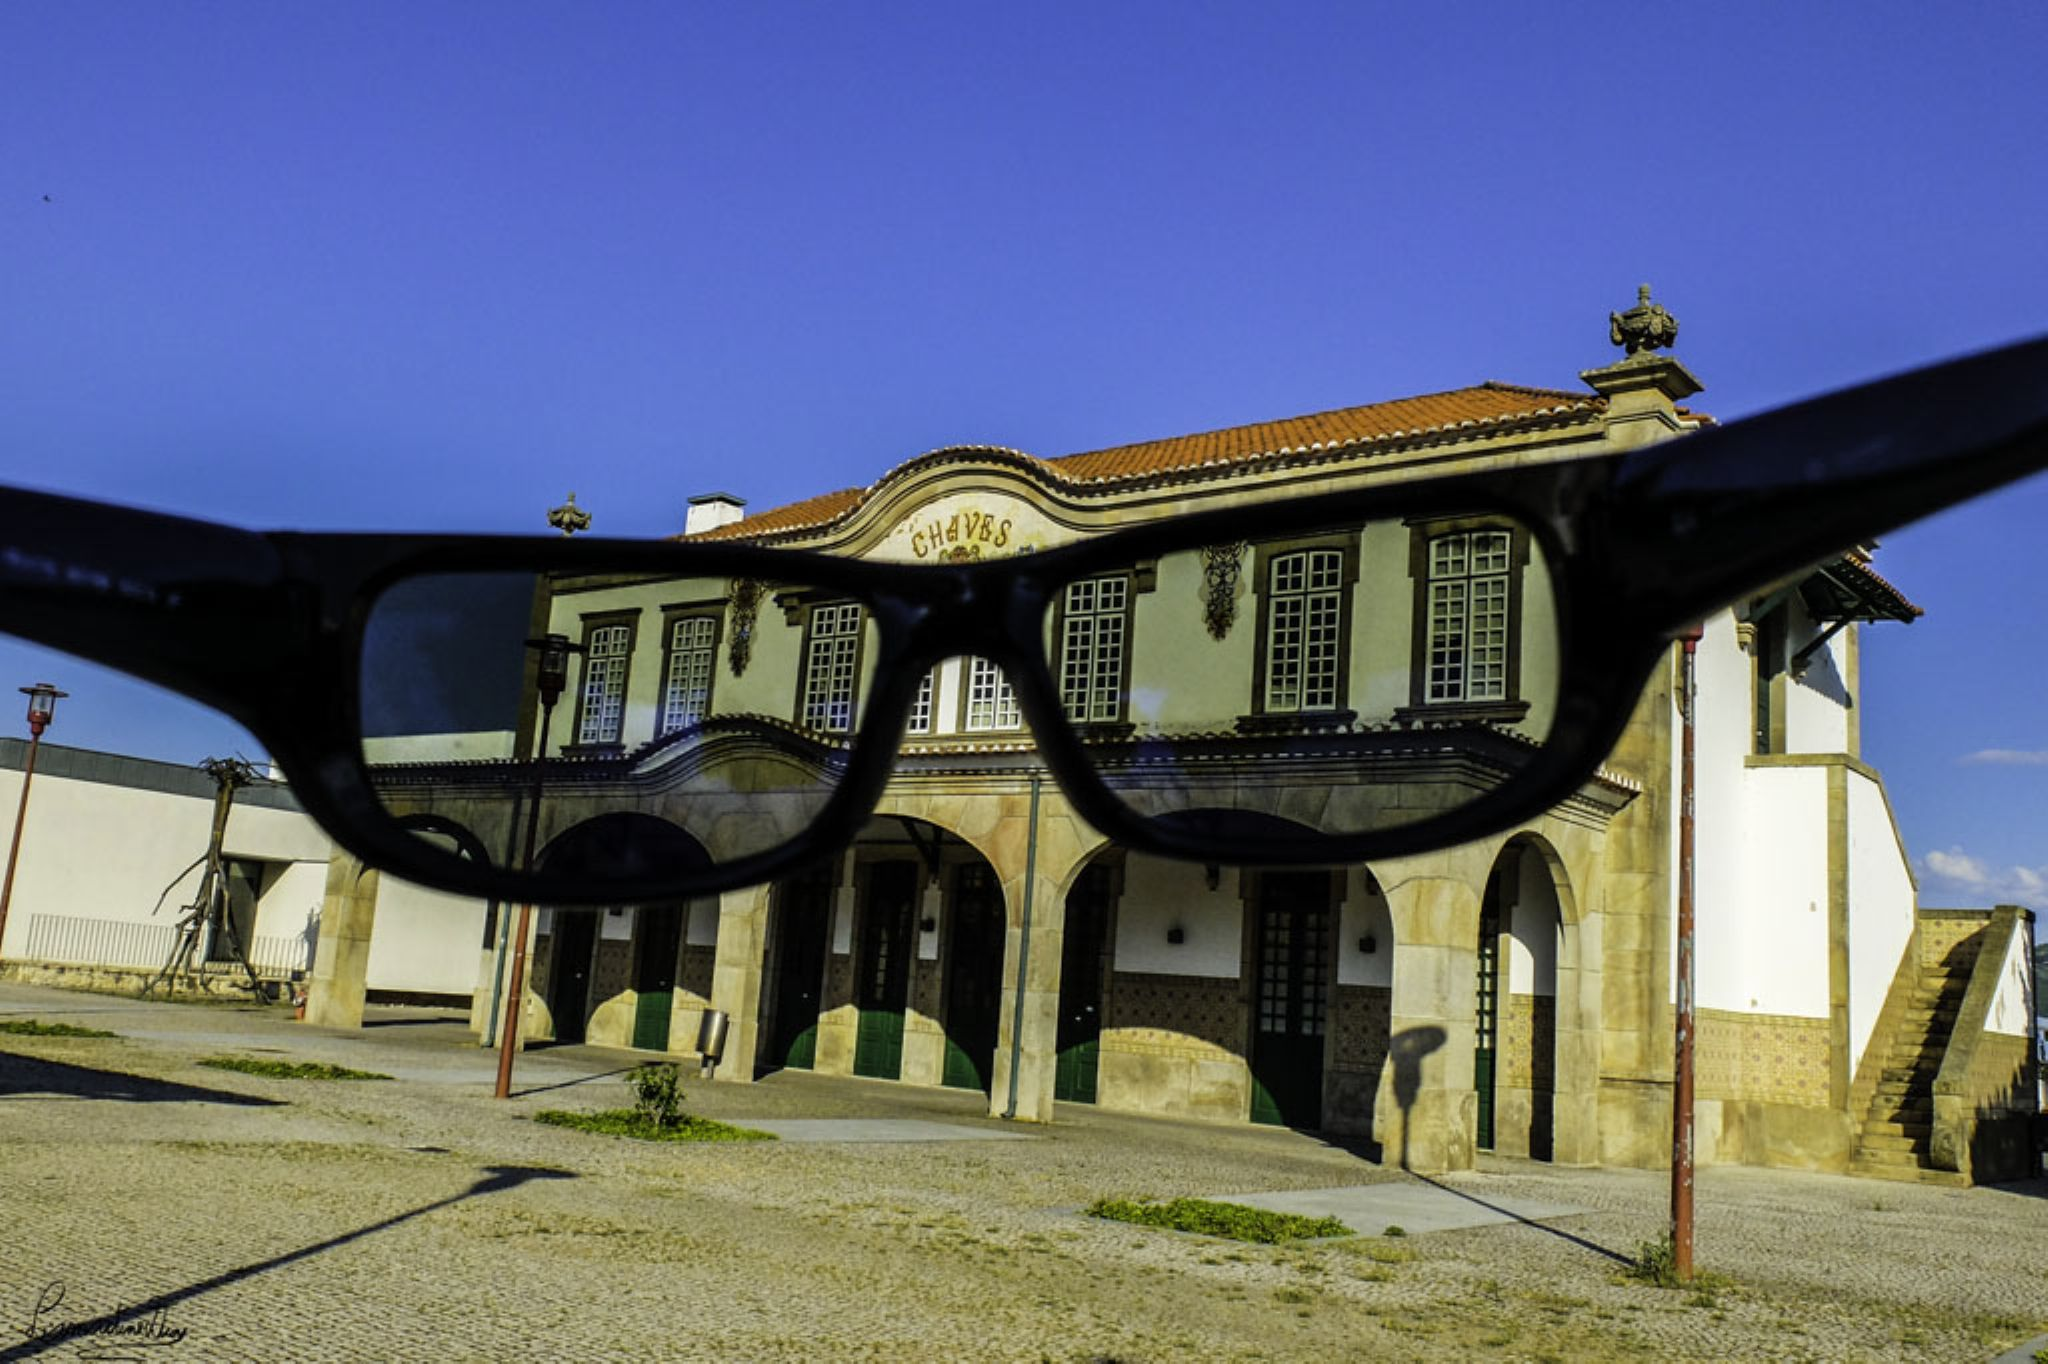 Through glasses by Lamartine Dias